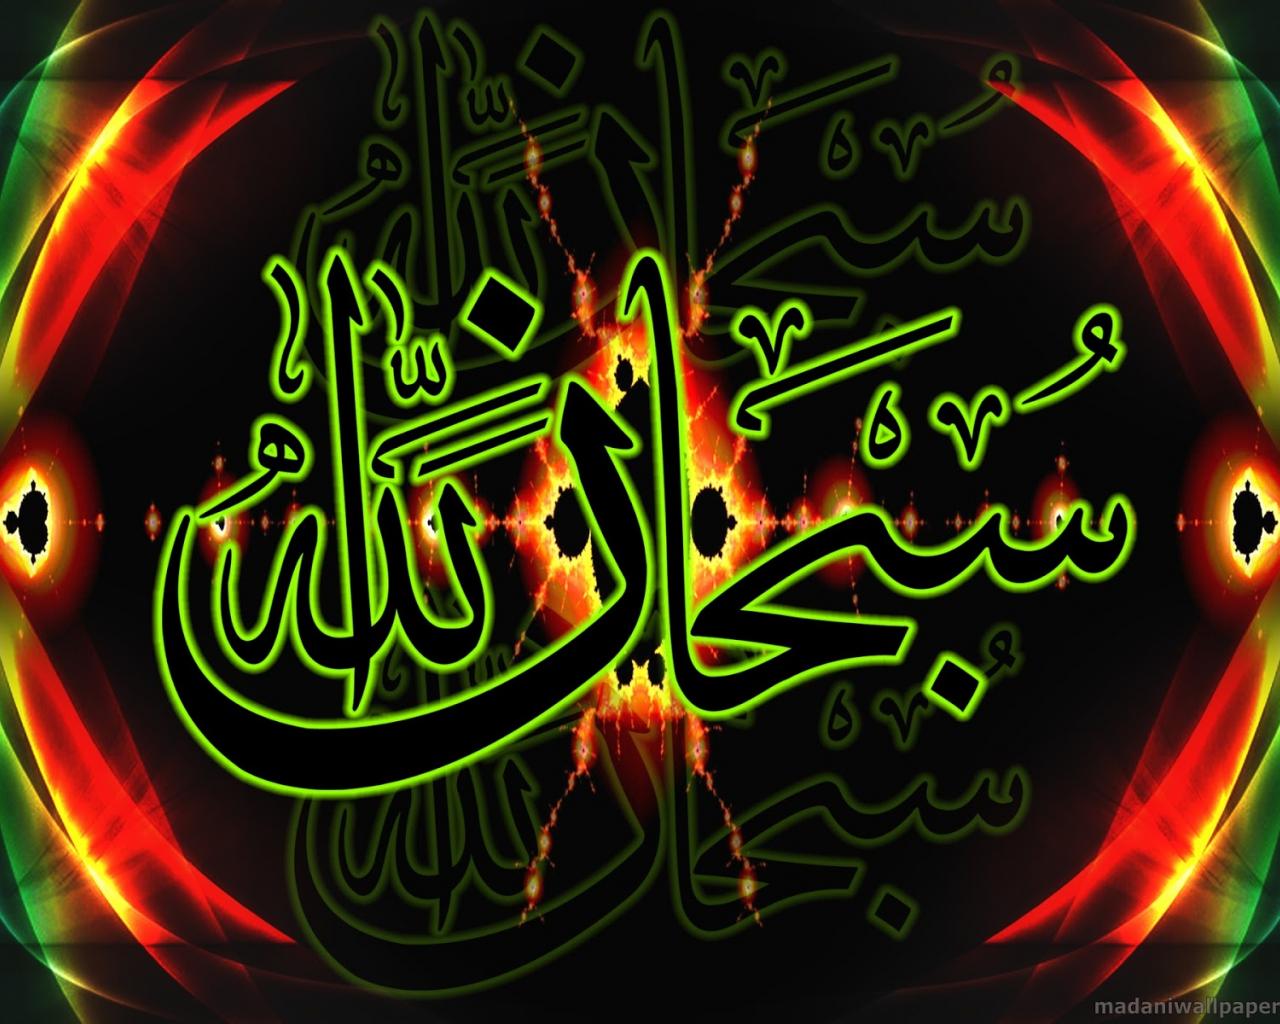 1600x1200px Most Beautiful Allah Muhammad Wallpaper Wallpapersafari